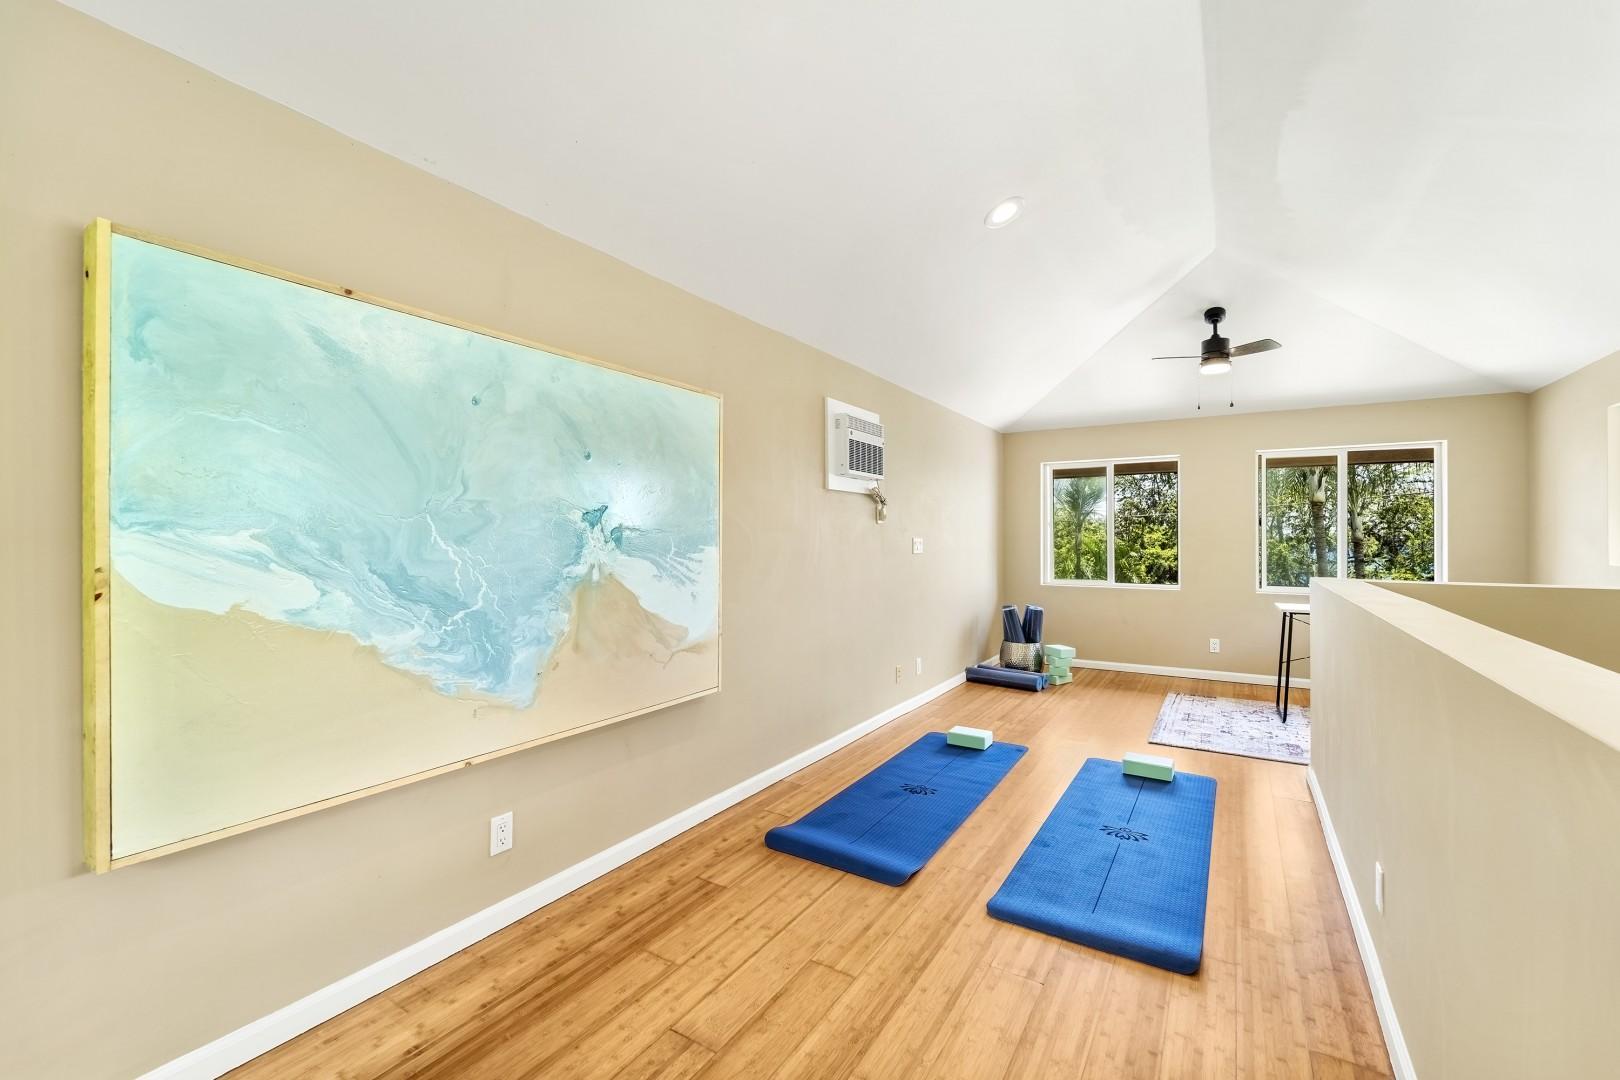 Yoga retreat on the third floor!